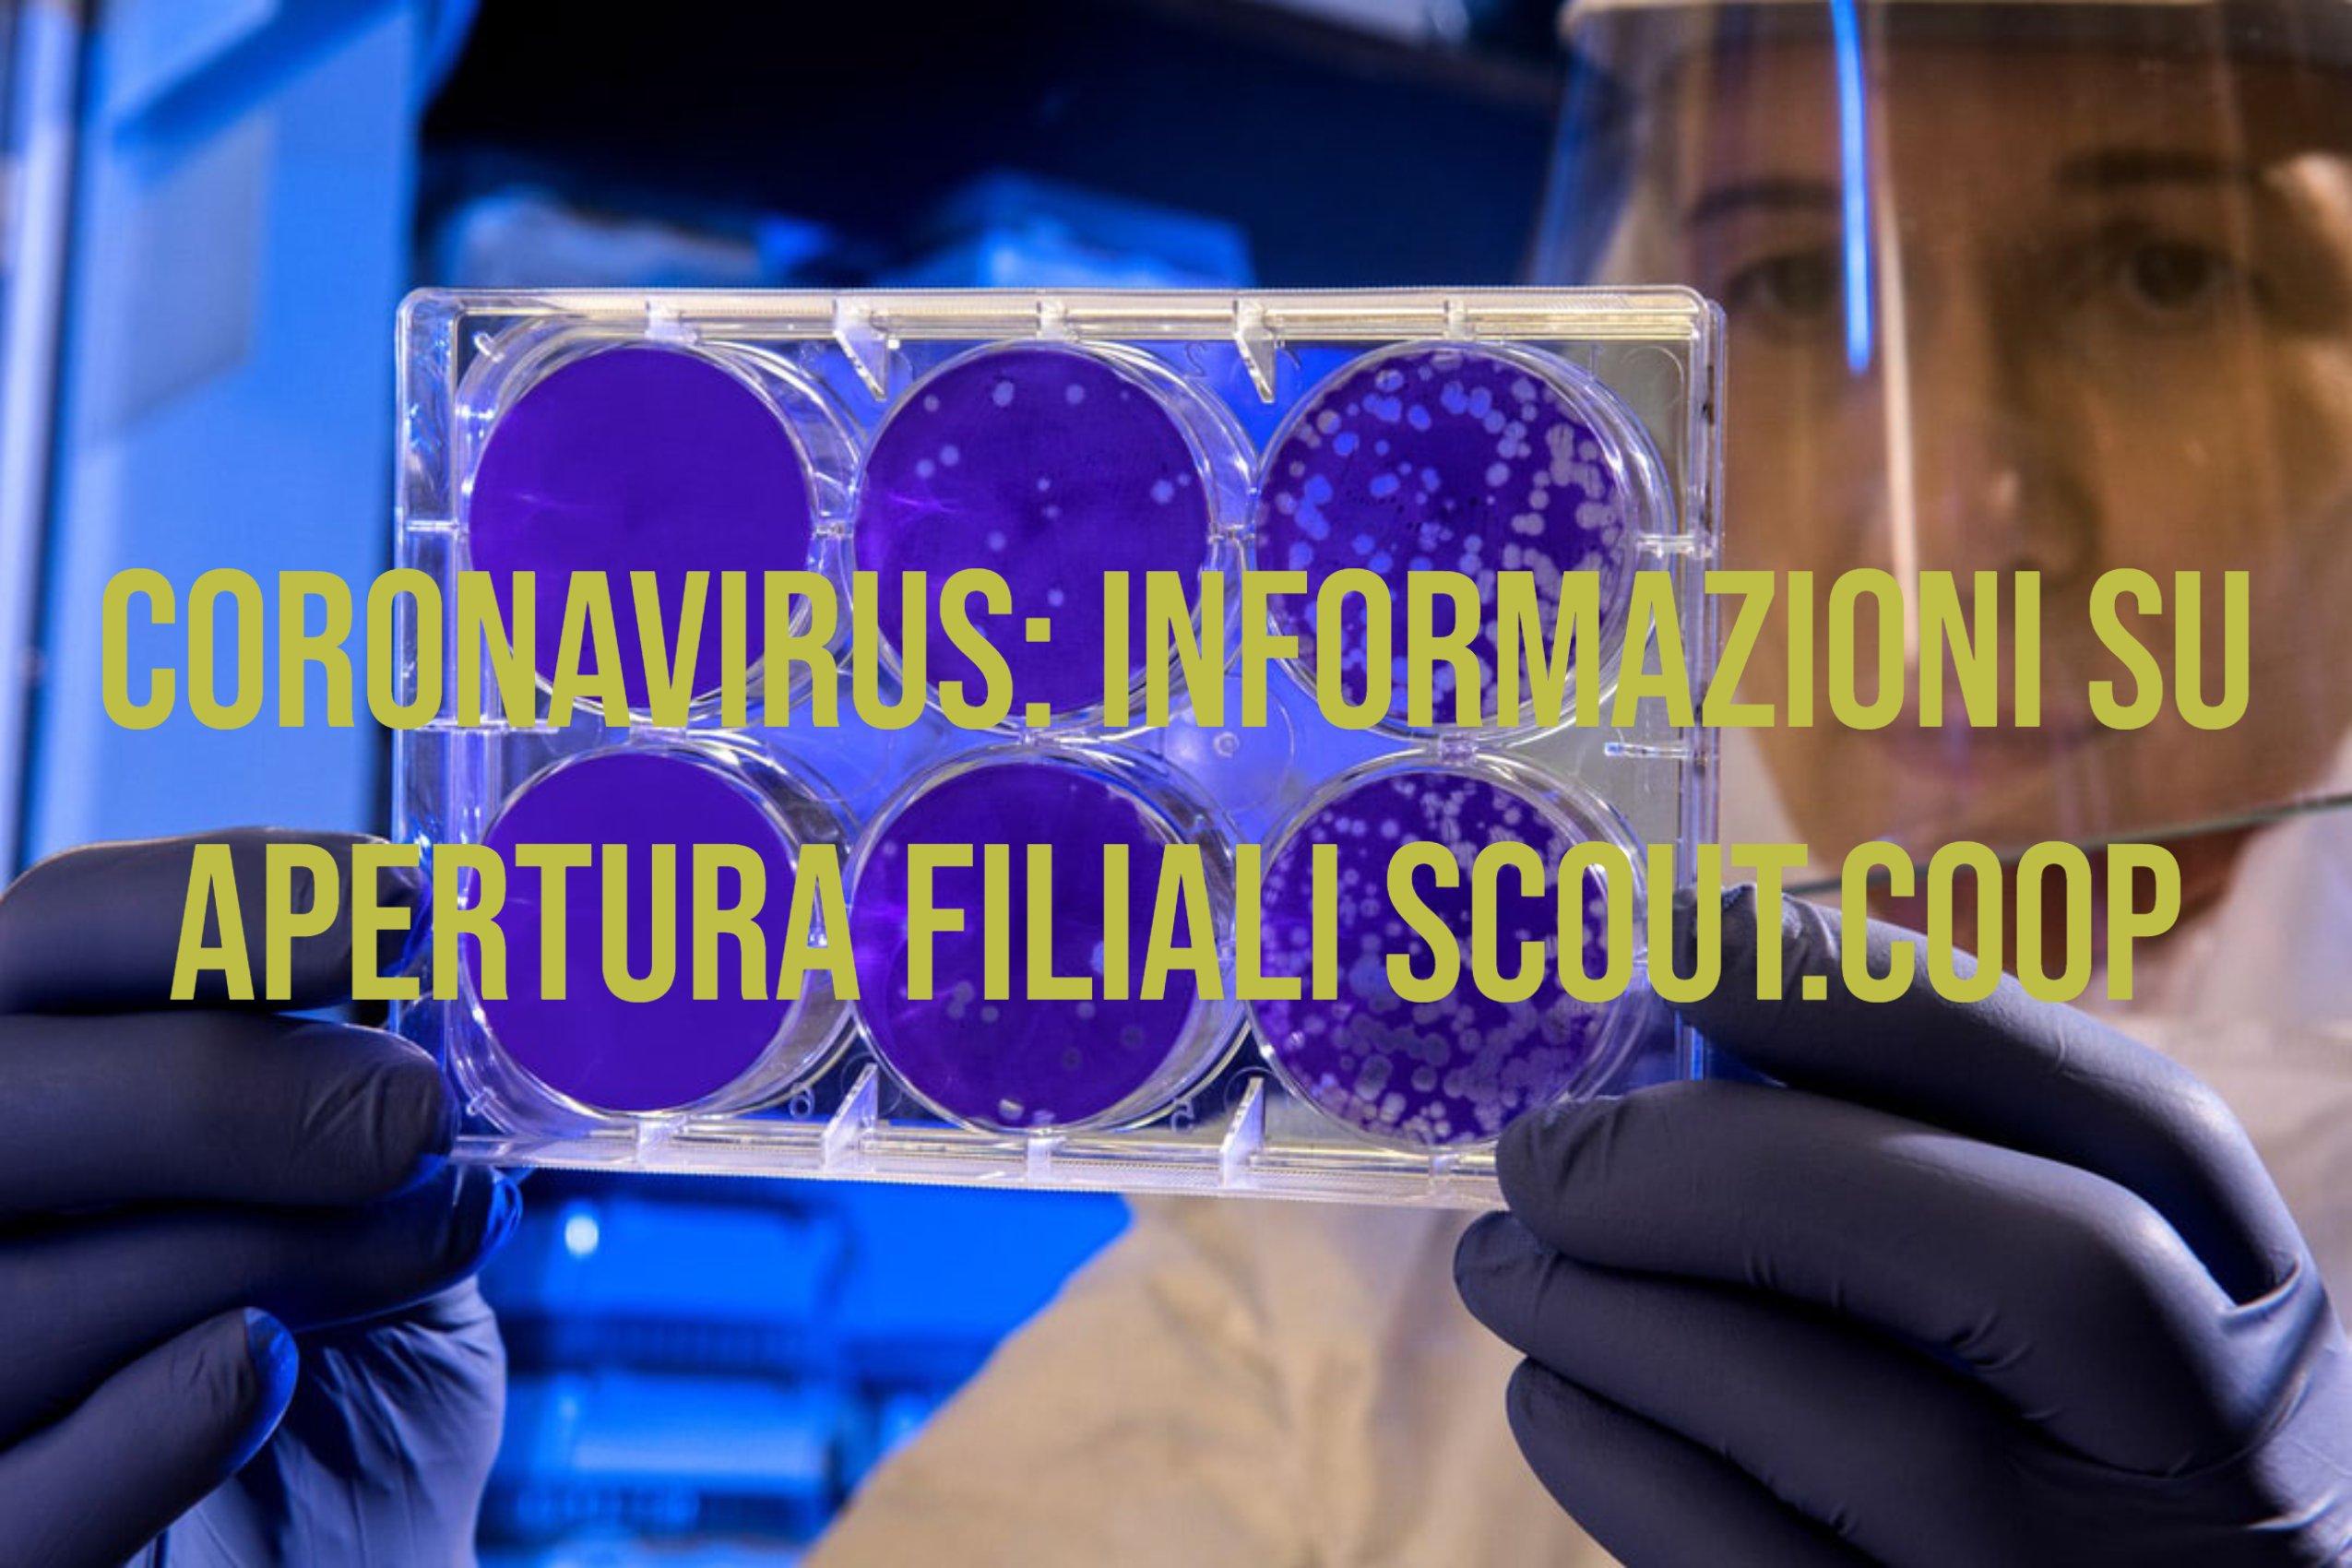 Informazioni apertura filiali Scout.coop Emergenza Coronavirus